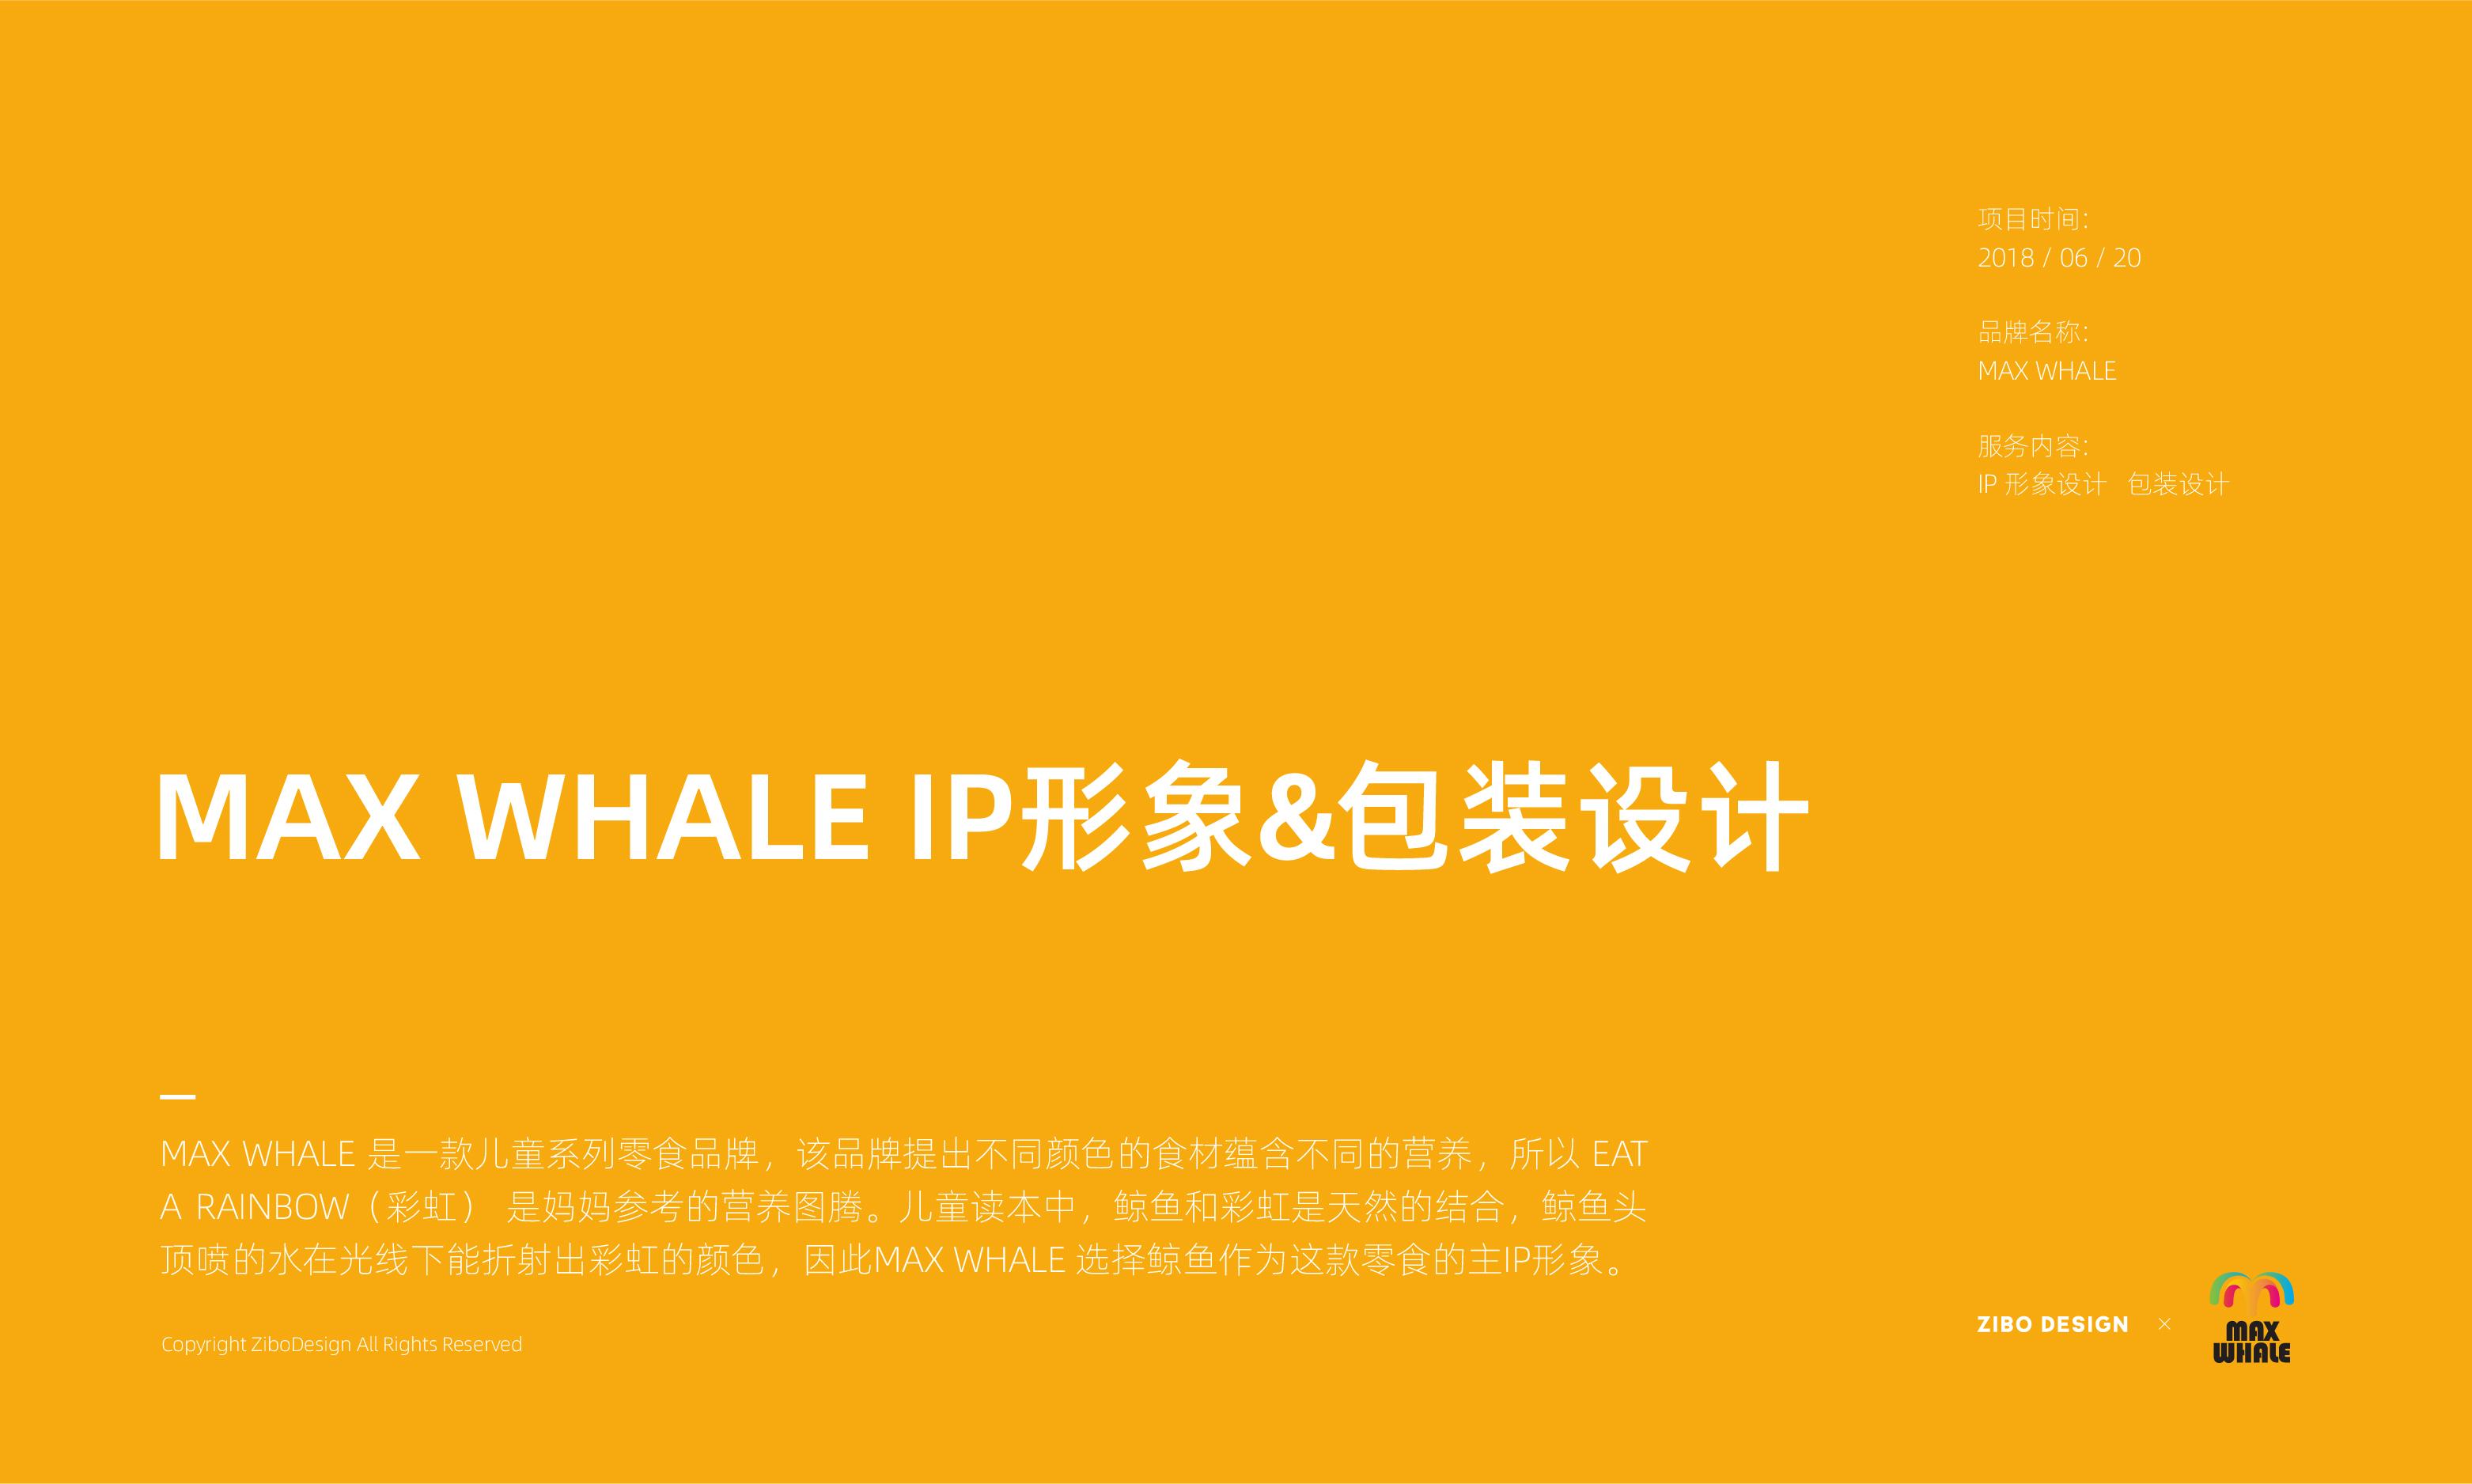 max whale ip形象設計 包裝設計